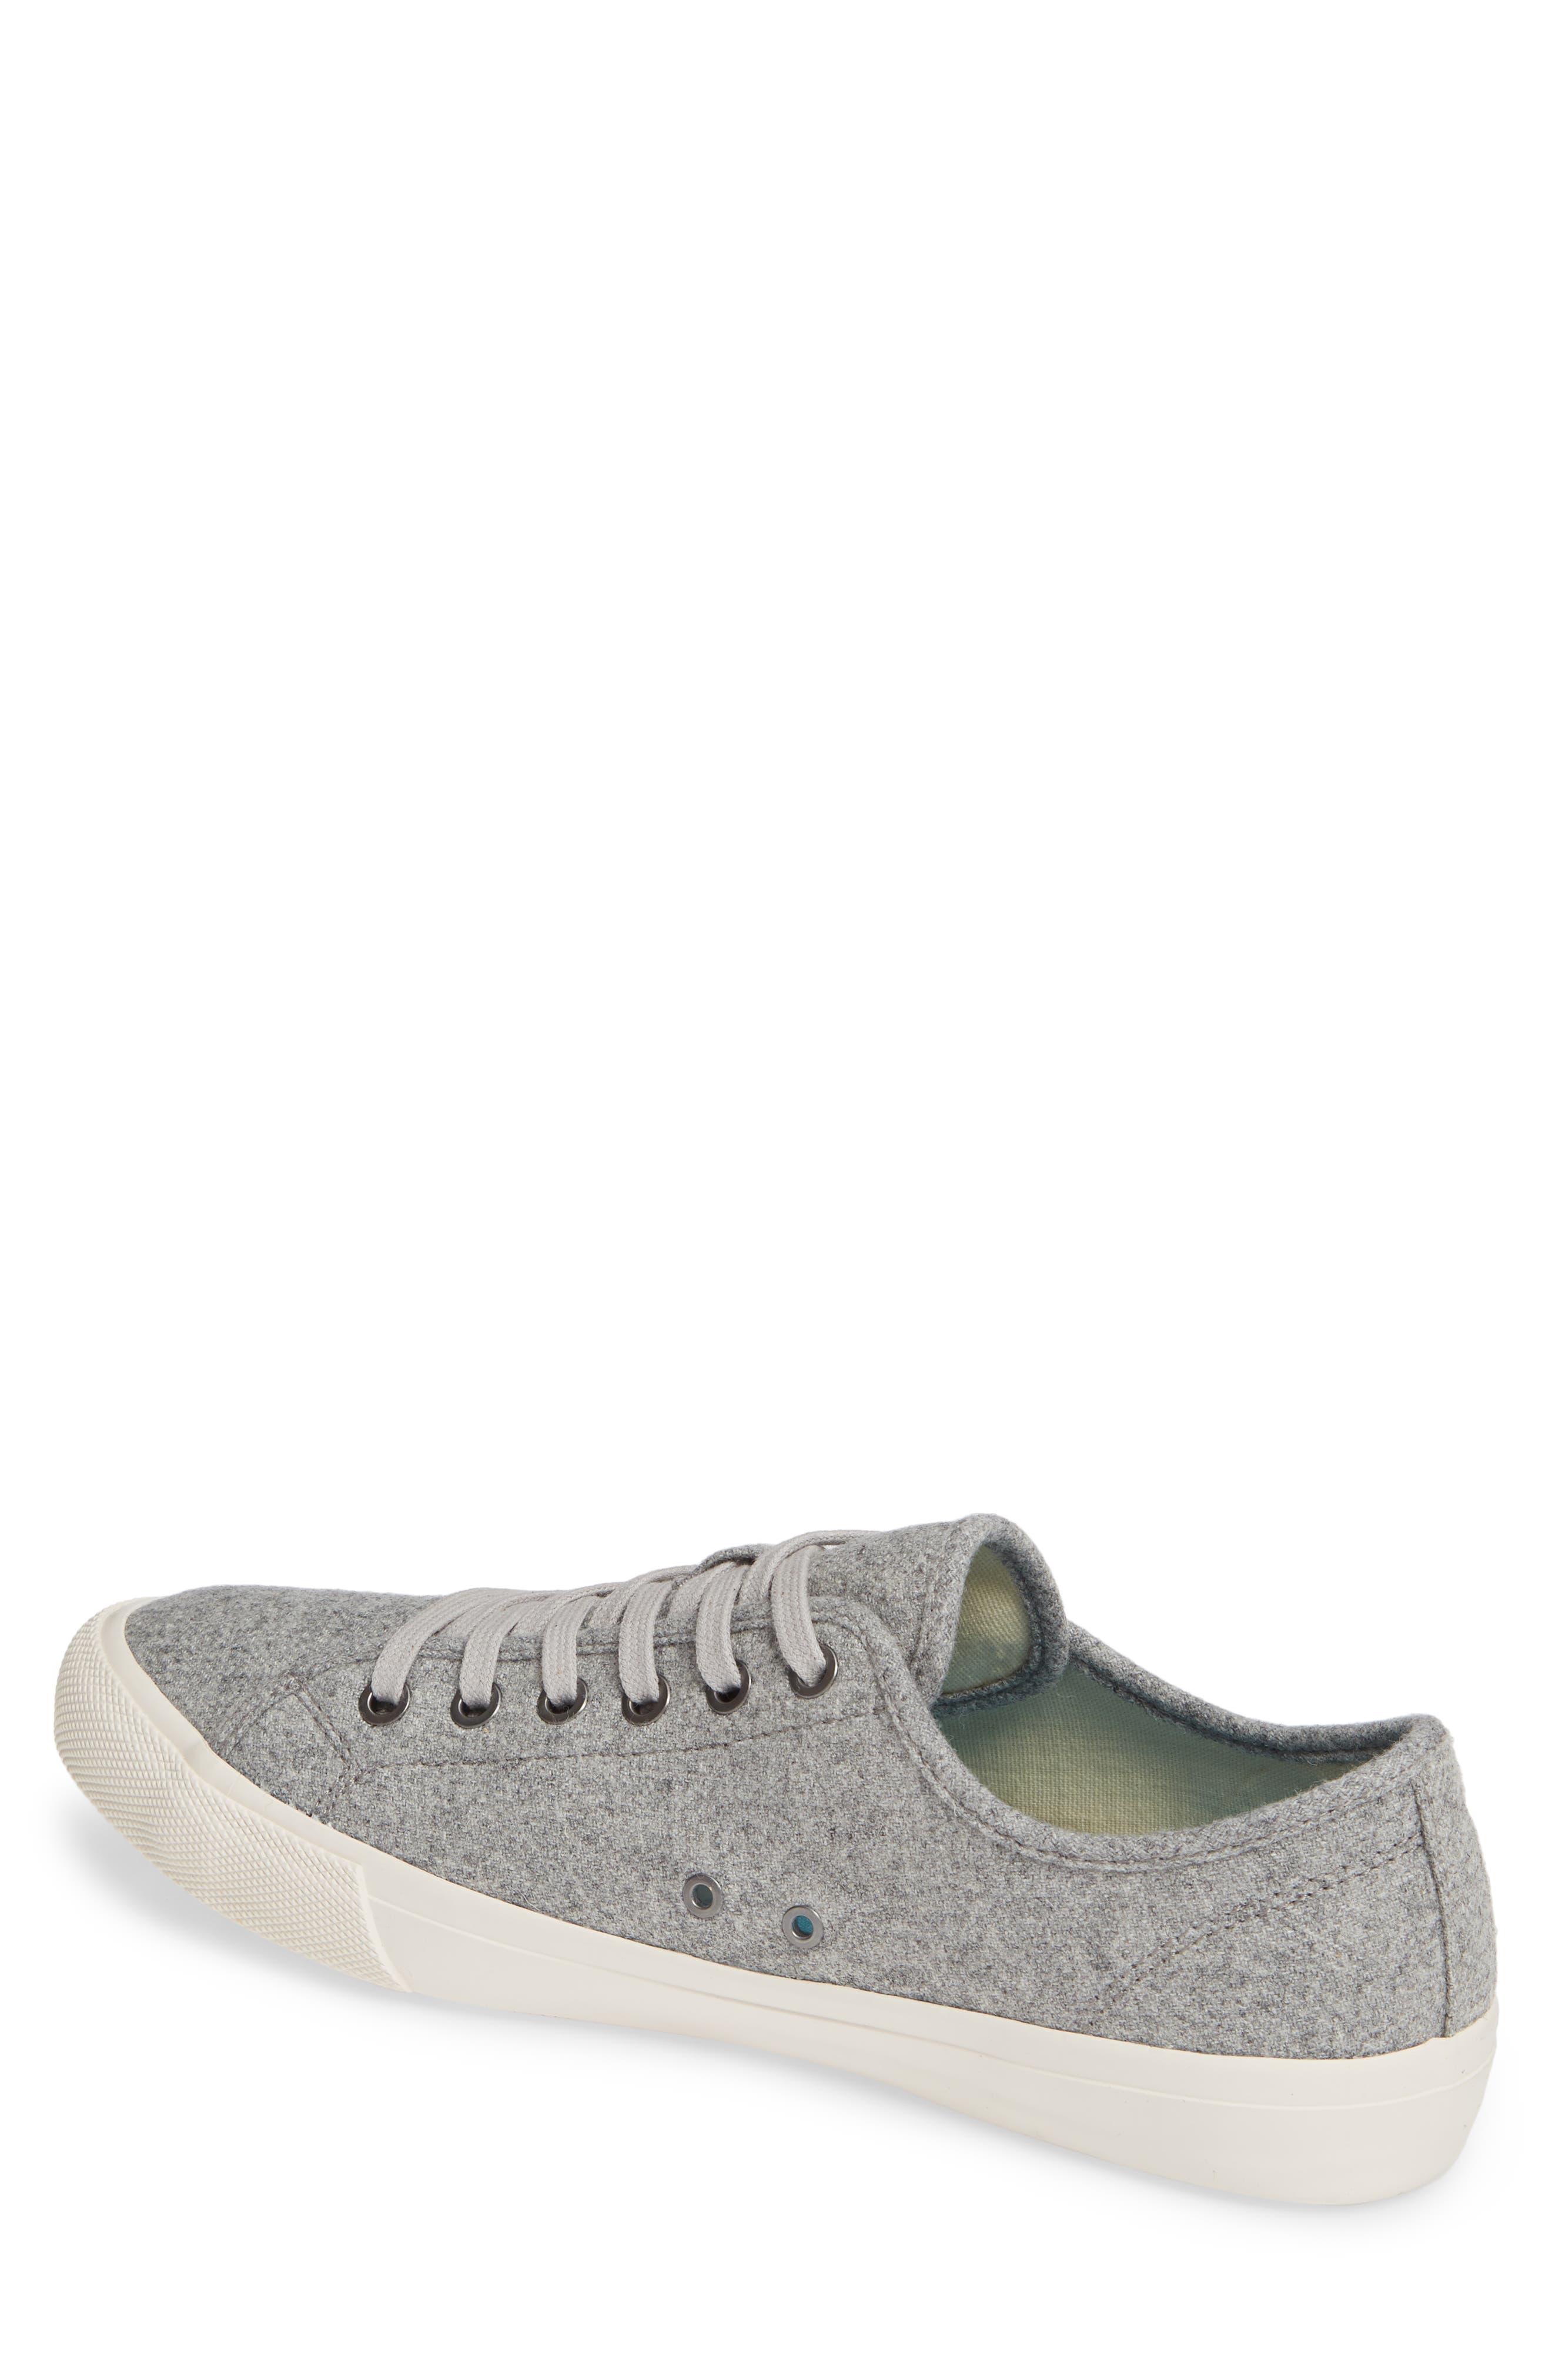 Monterey Grayers Sneaker,                             Alternate thumbnail 2, color,                             LIGHT GREY WOOL